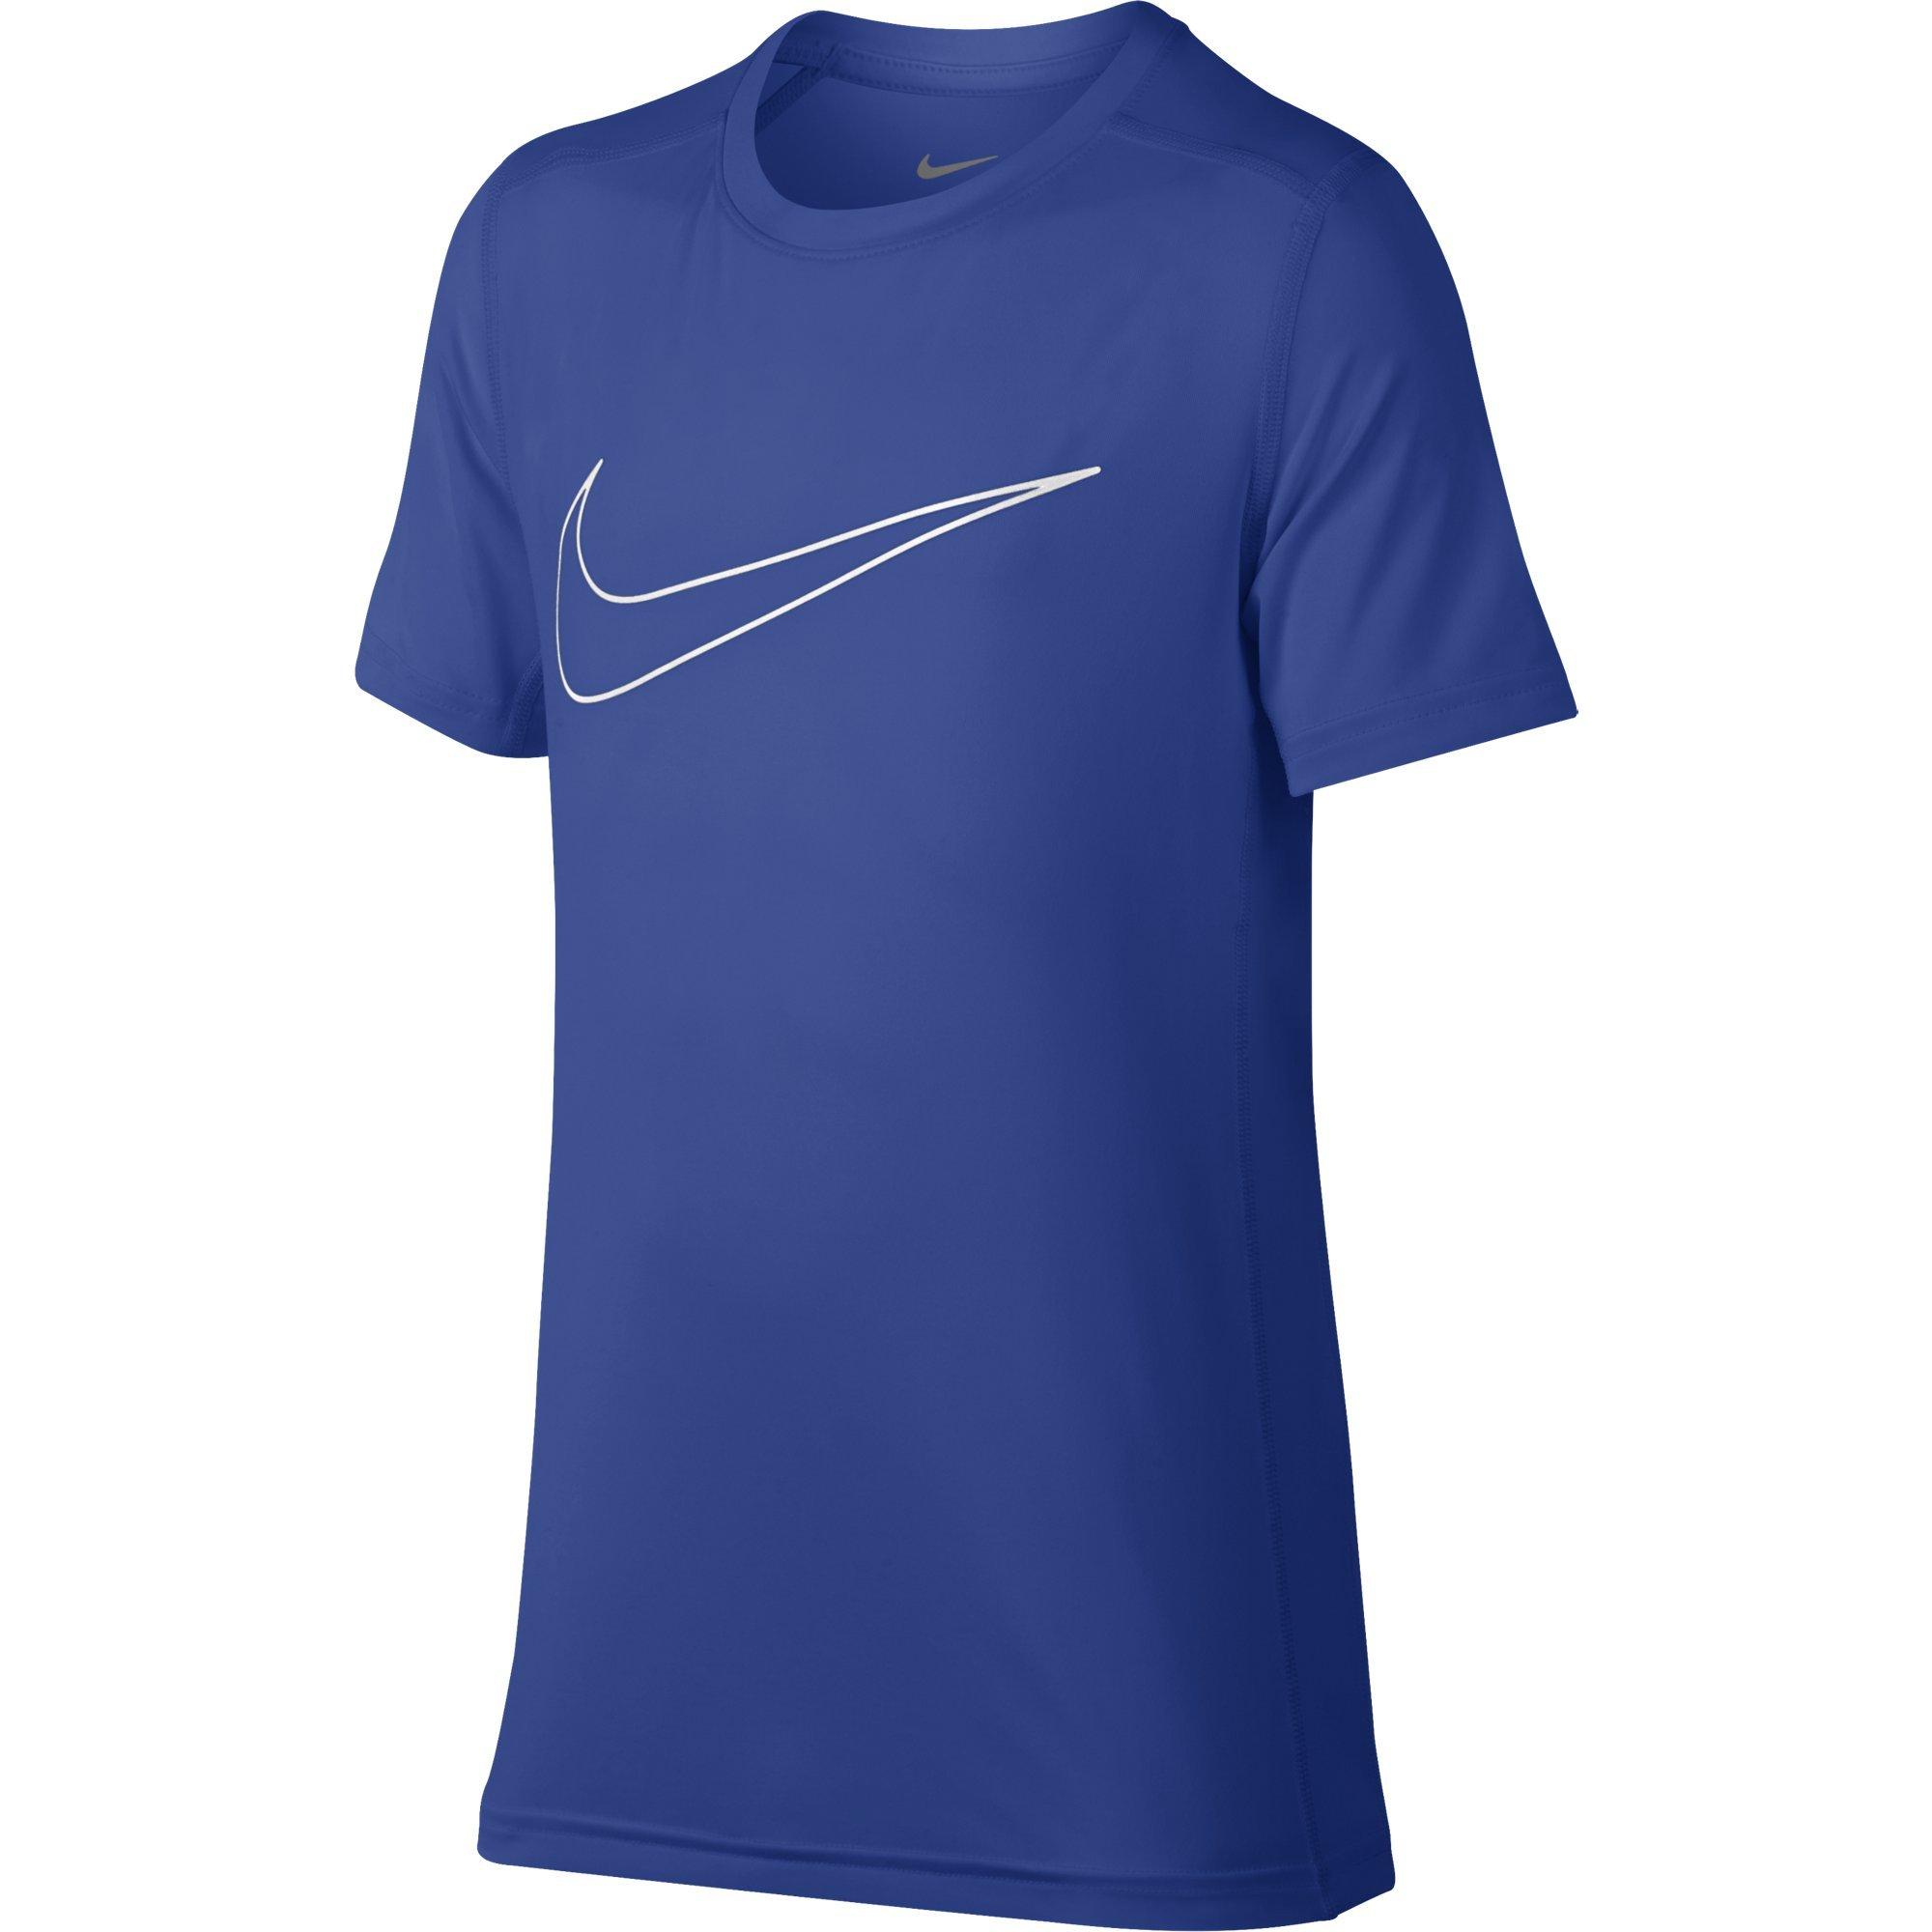 NIKE Boys' Short-Sleeve Training Shirt, Game Royal, Small